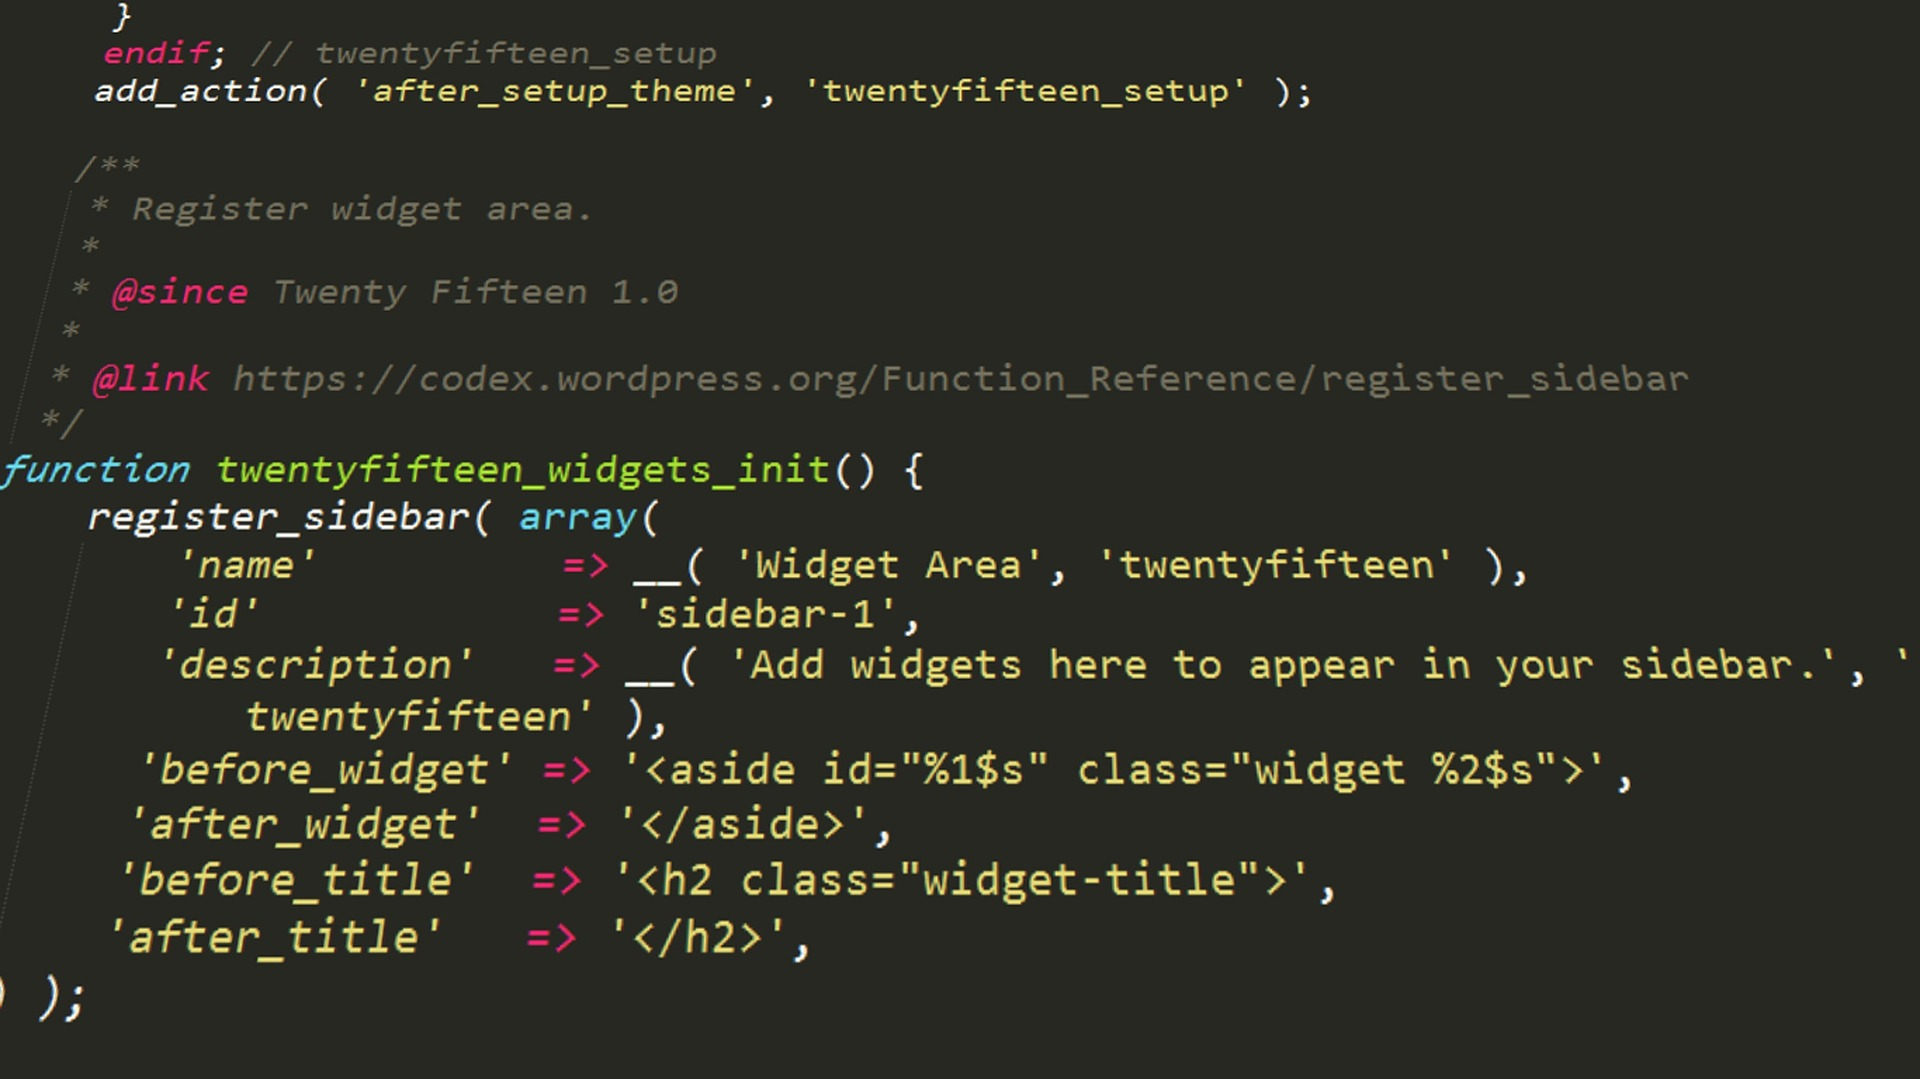 WordPressのテーマ・テンプレートのディレクトリを取得する方法